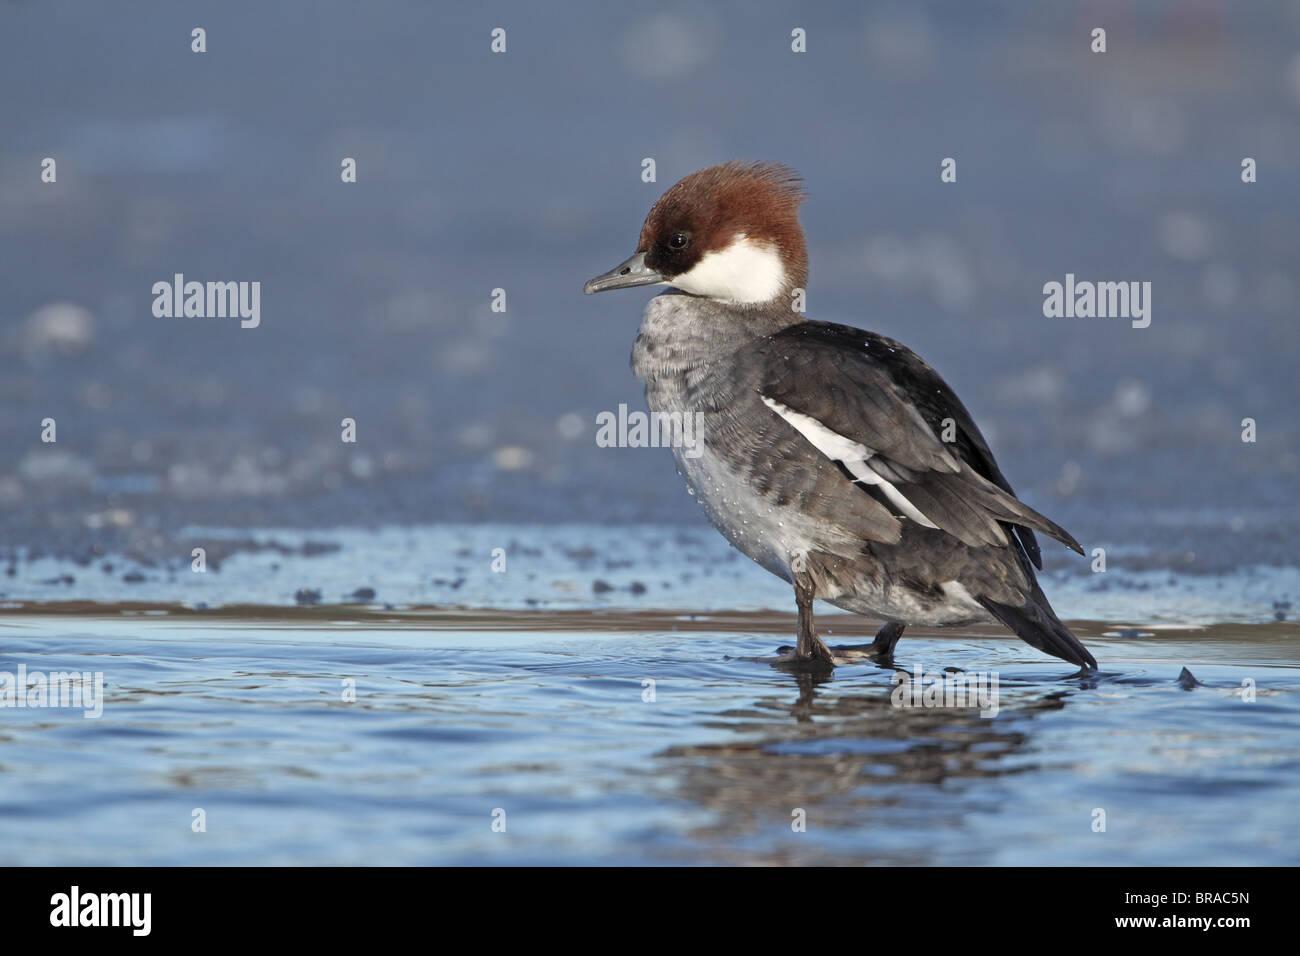 Smew, Mergus albellus, duck on ice - Stock Image